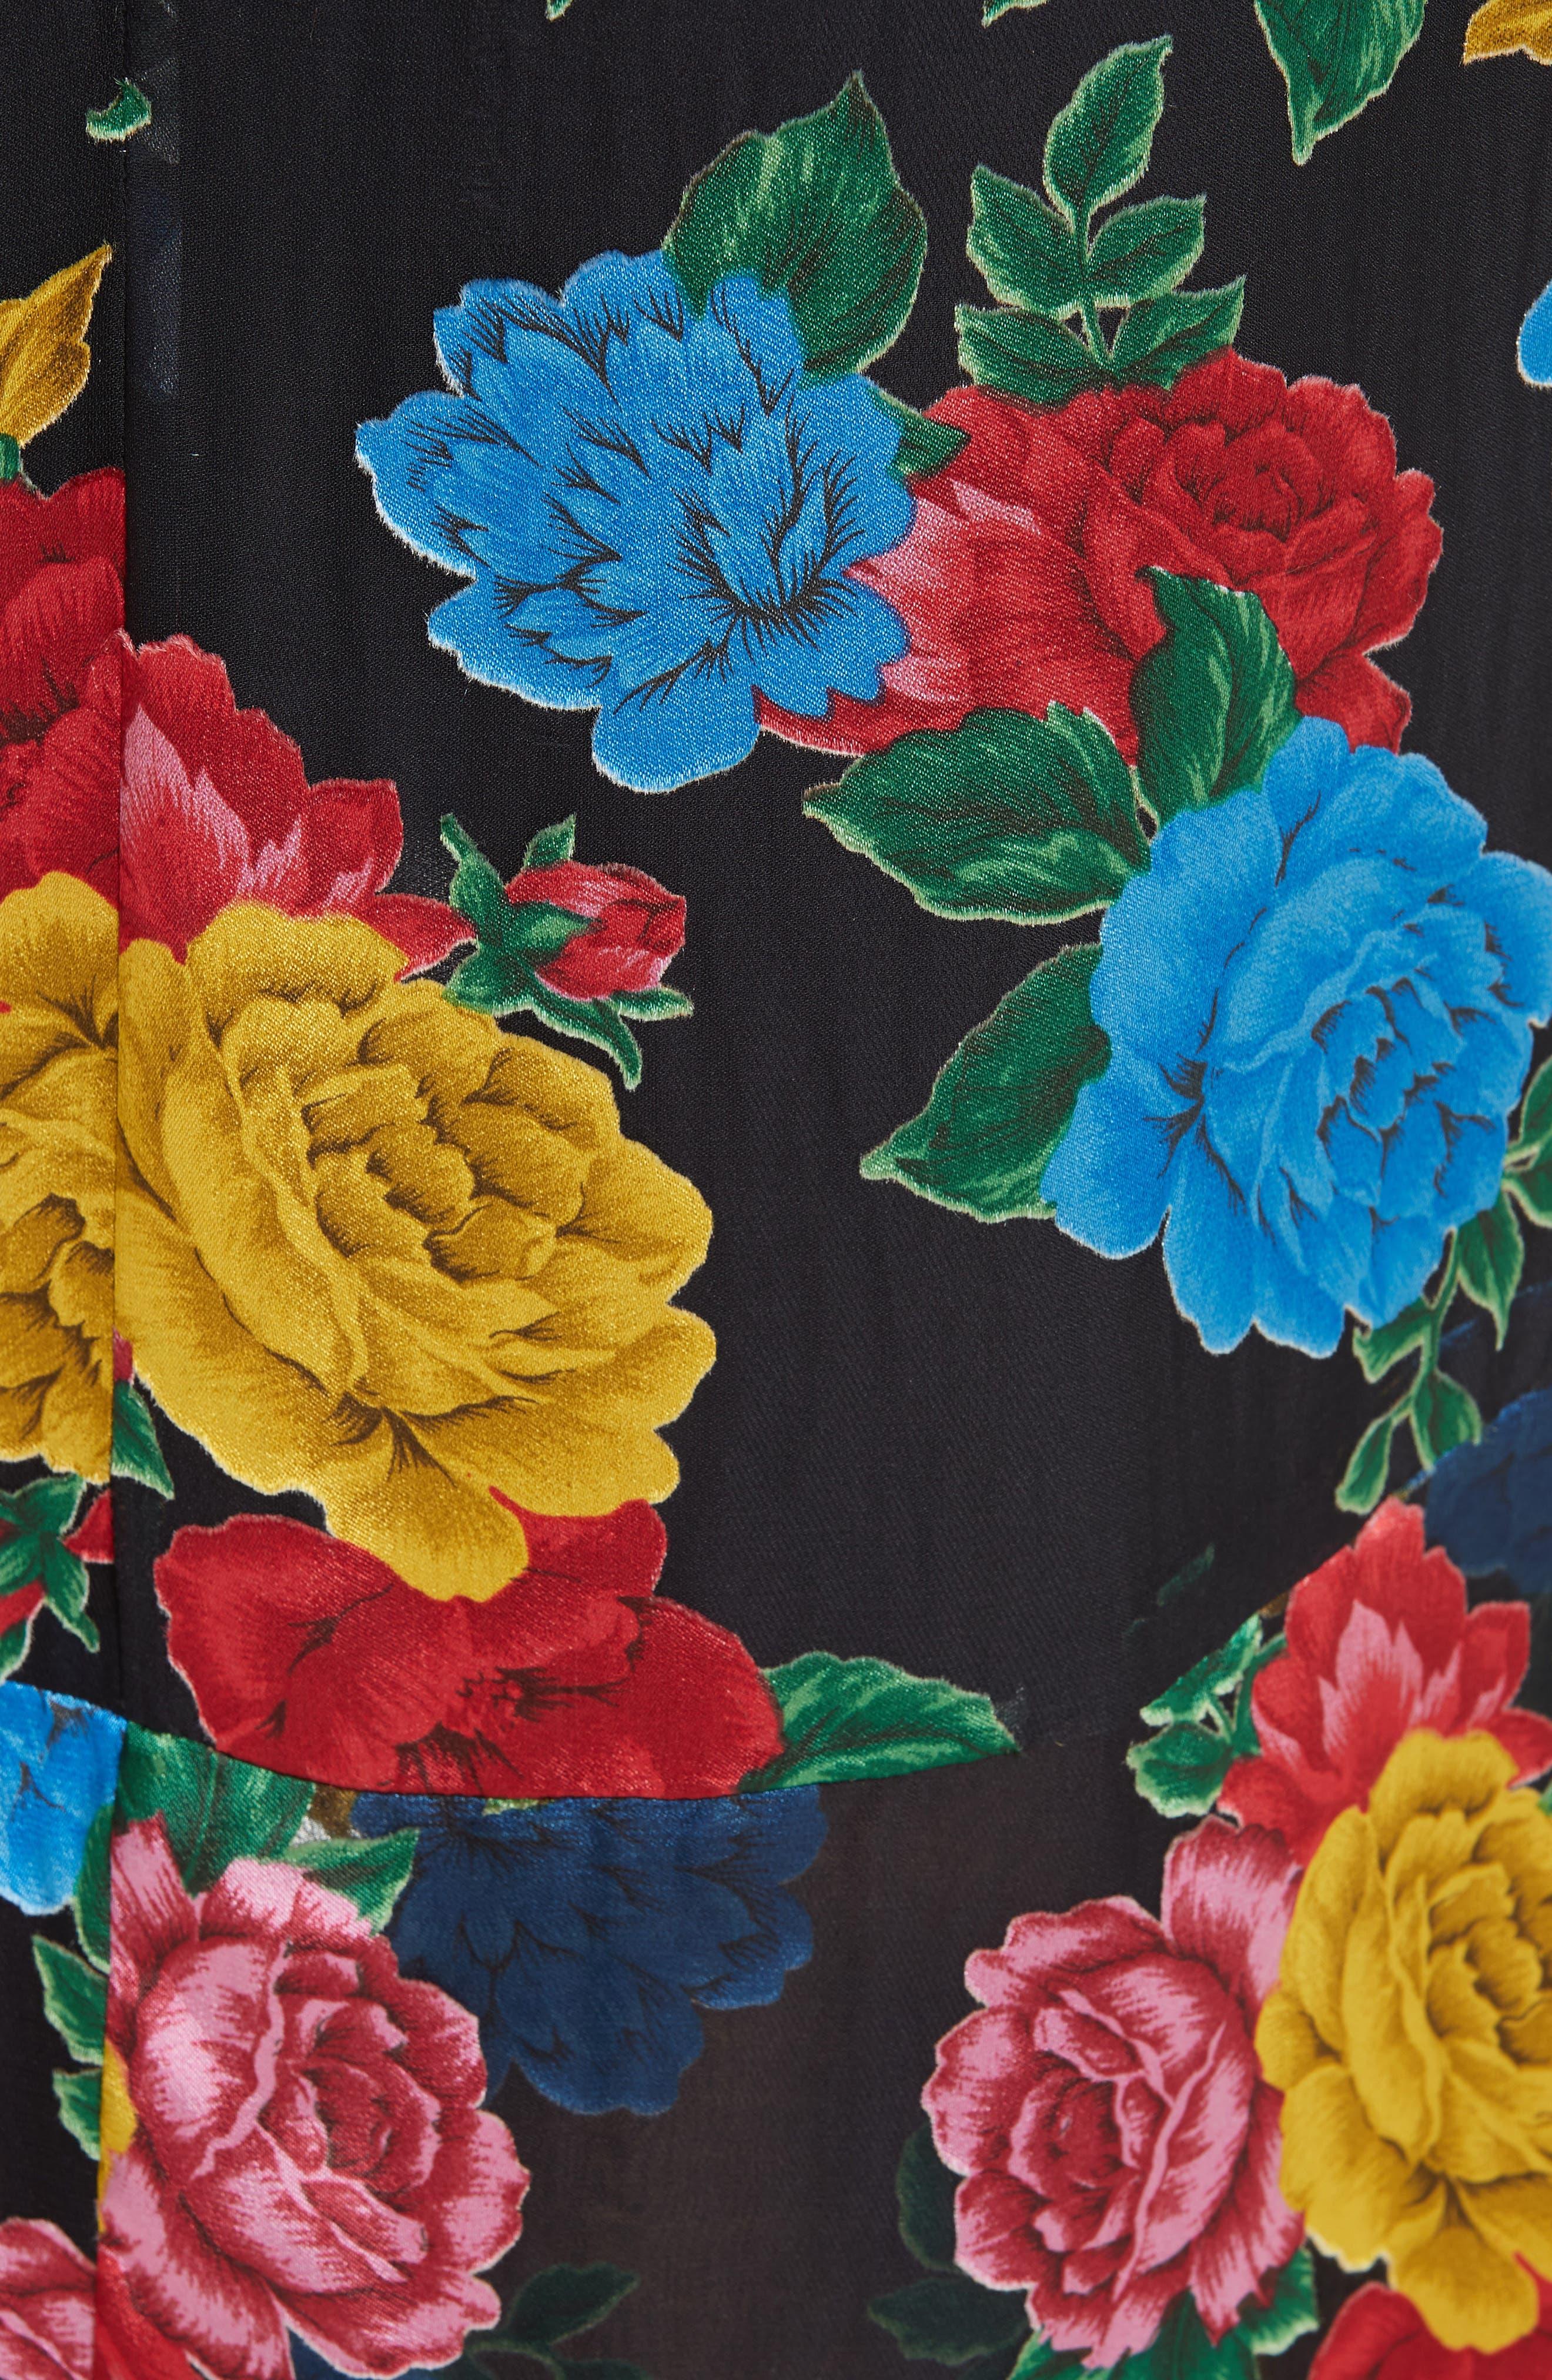 Erika Ruffle High/Low Midi Dress,                             Alternate thumbnail 6, color,                             CAMELLIA BOUQUET BLACK/ MULTI